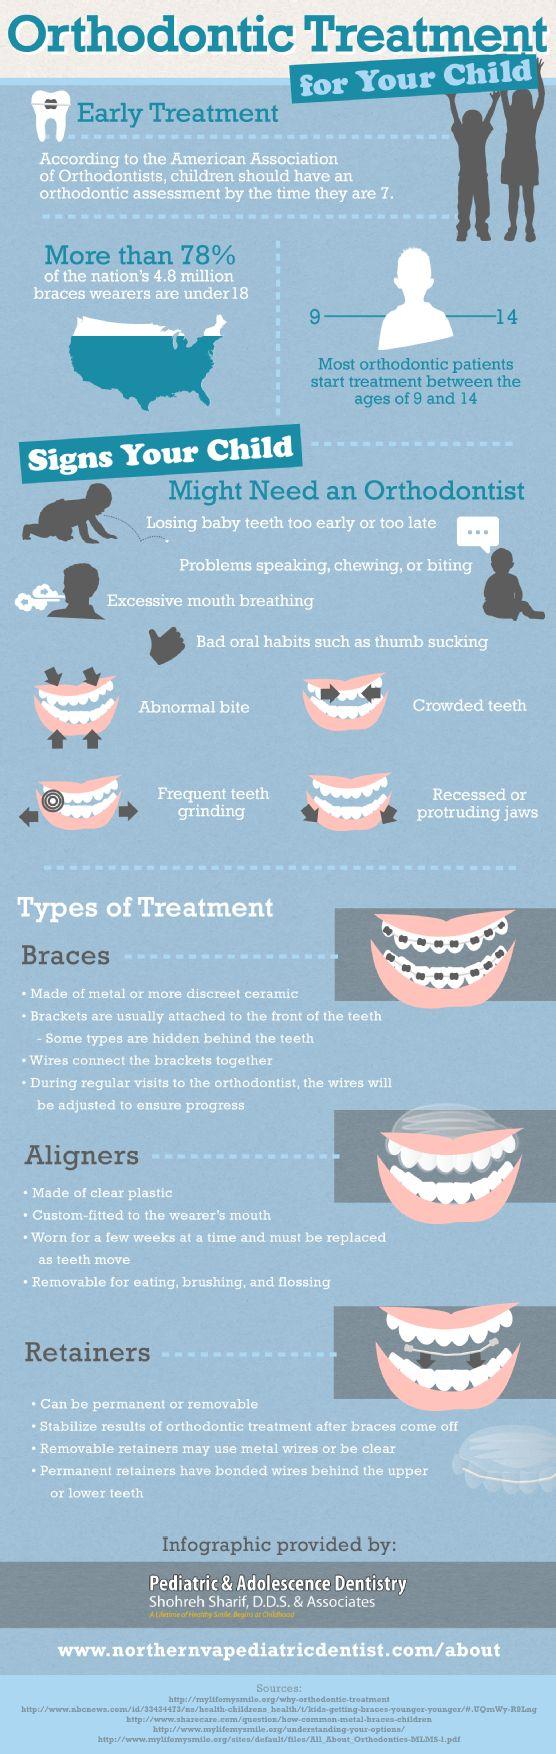 51 best Dr. Jackie Recommends images on Pinterest | Dental care ...